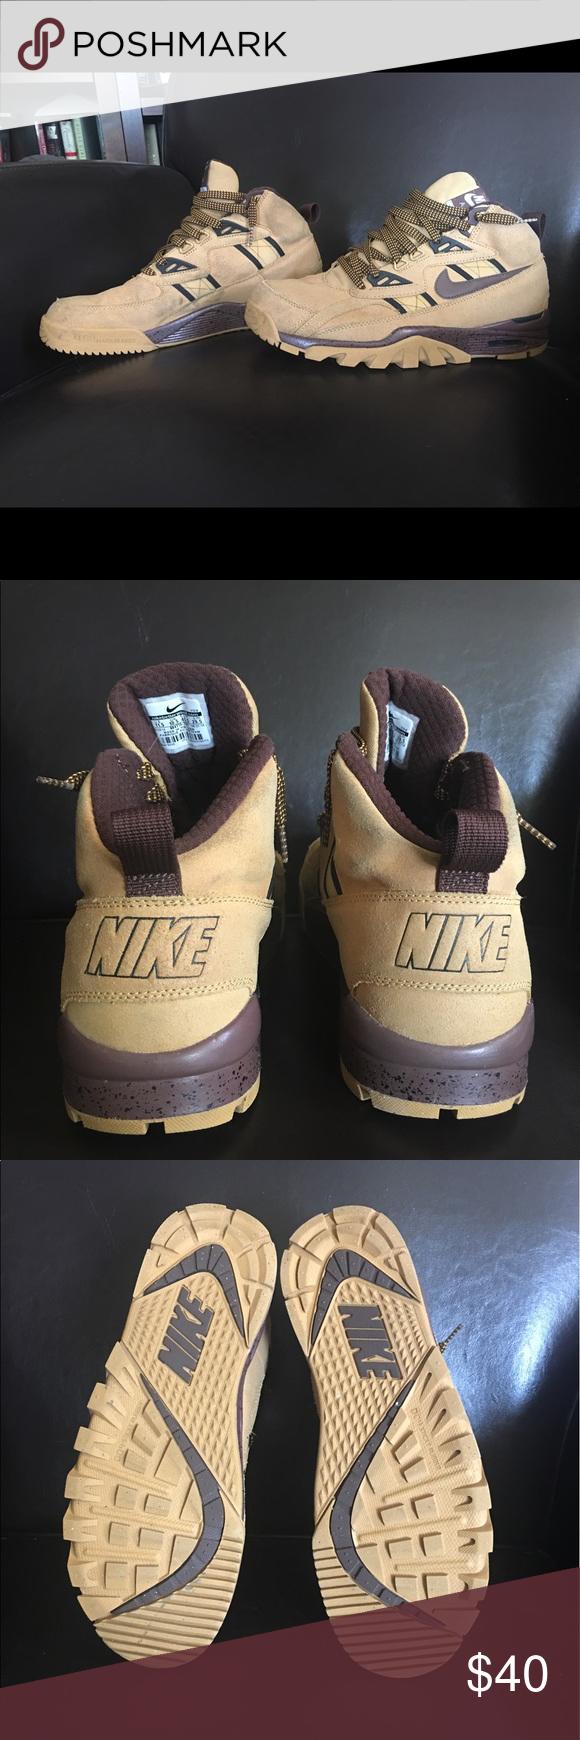 Nike Air Corte Bajo Impermeables Nike Calzado Y Botas Impermeables Bajo Pinterest e85241